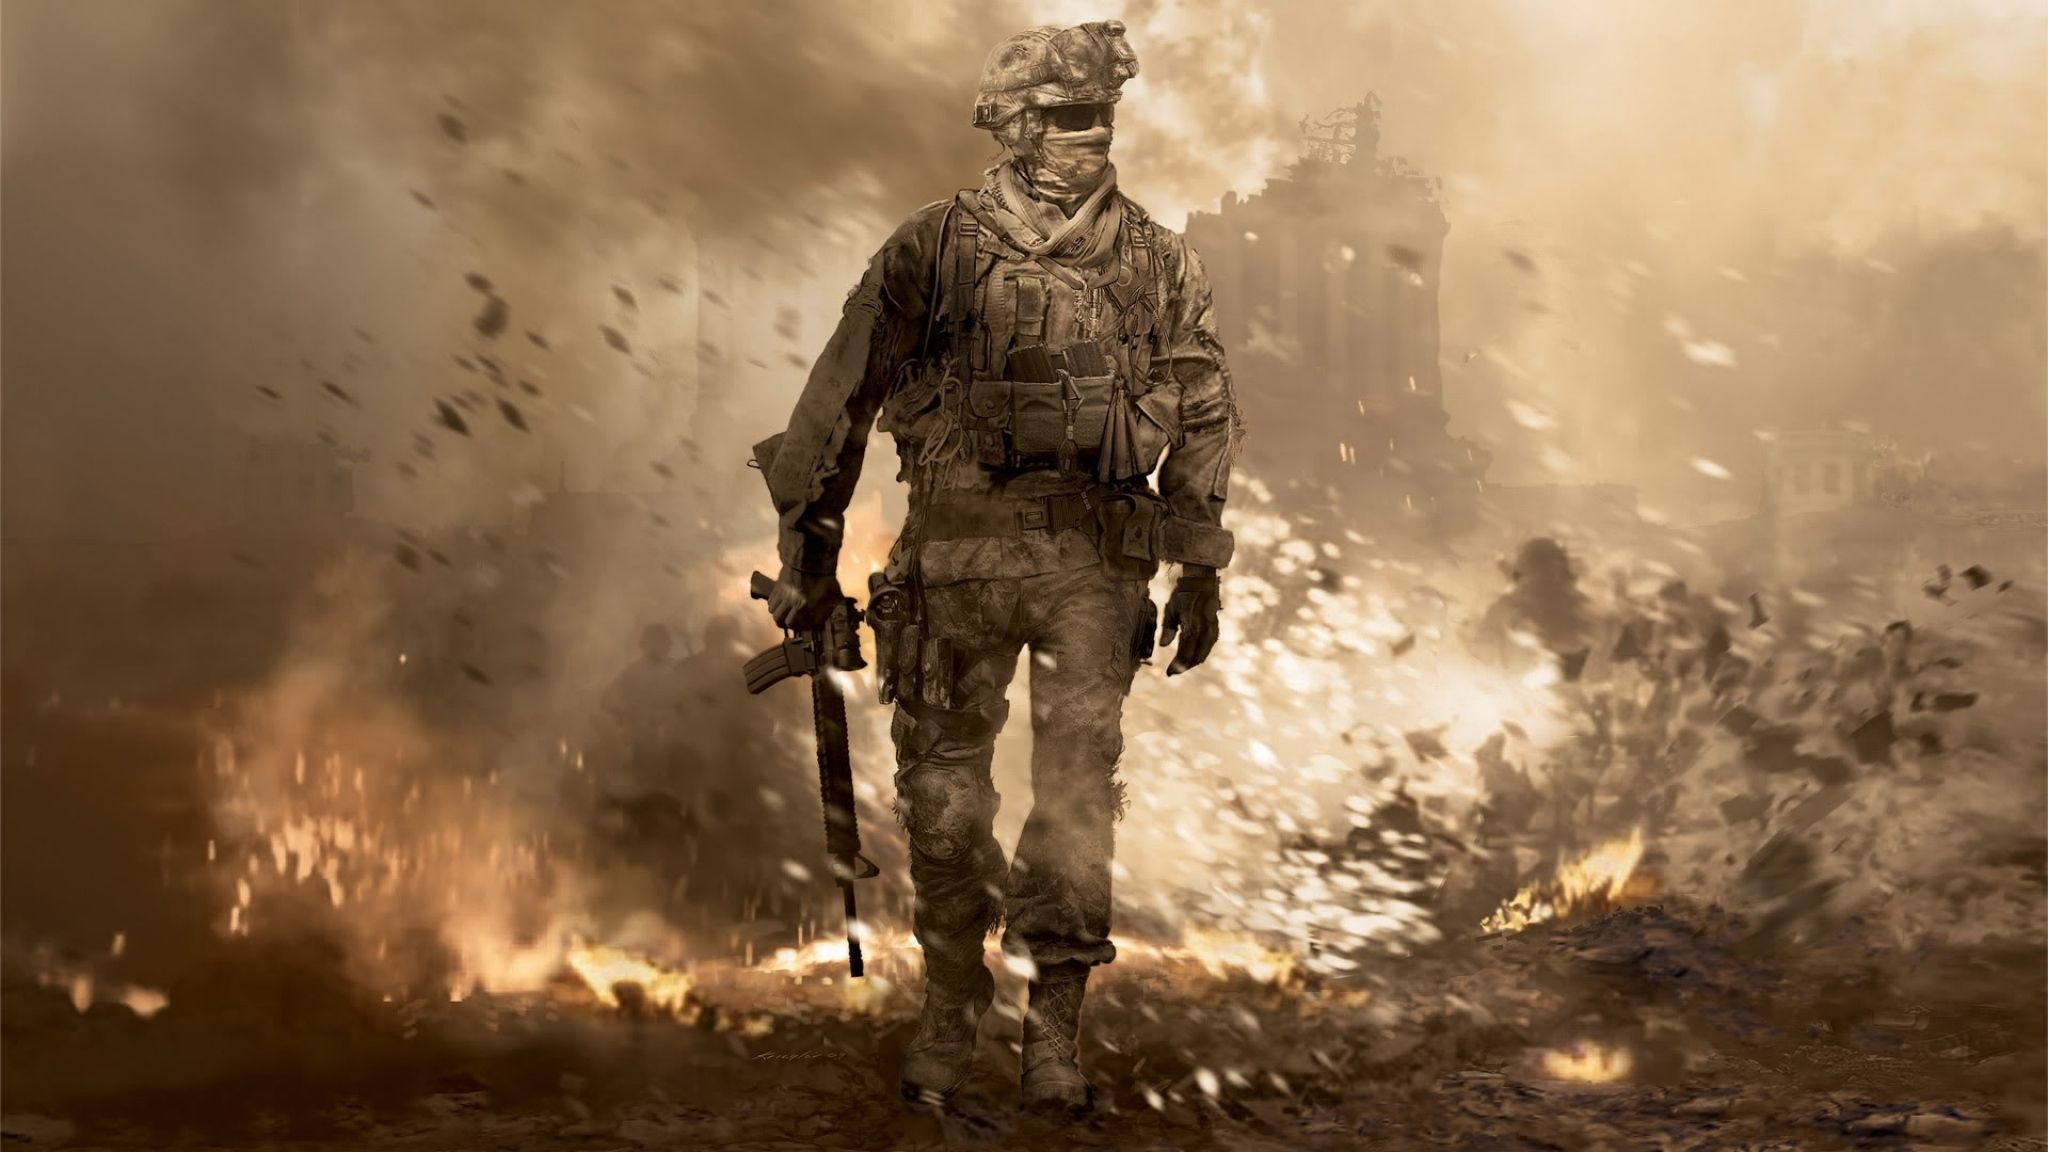 Hd Call Of Duty Wallpapers Hd Desktop Backgrounds 2048x1152 Modern Warfare Call Of Duty Infinite Call Of Duty